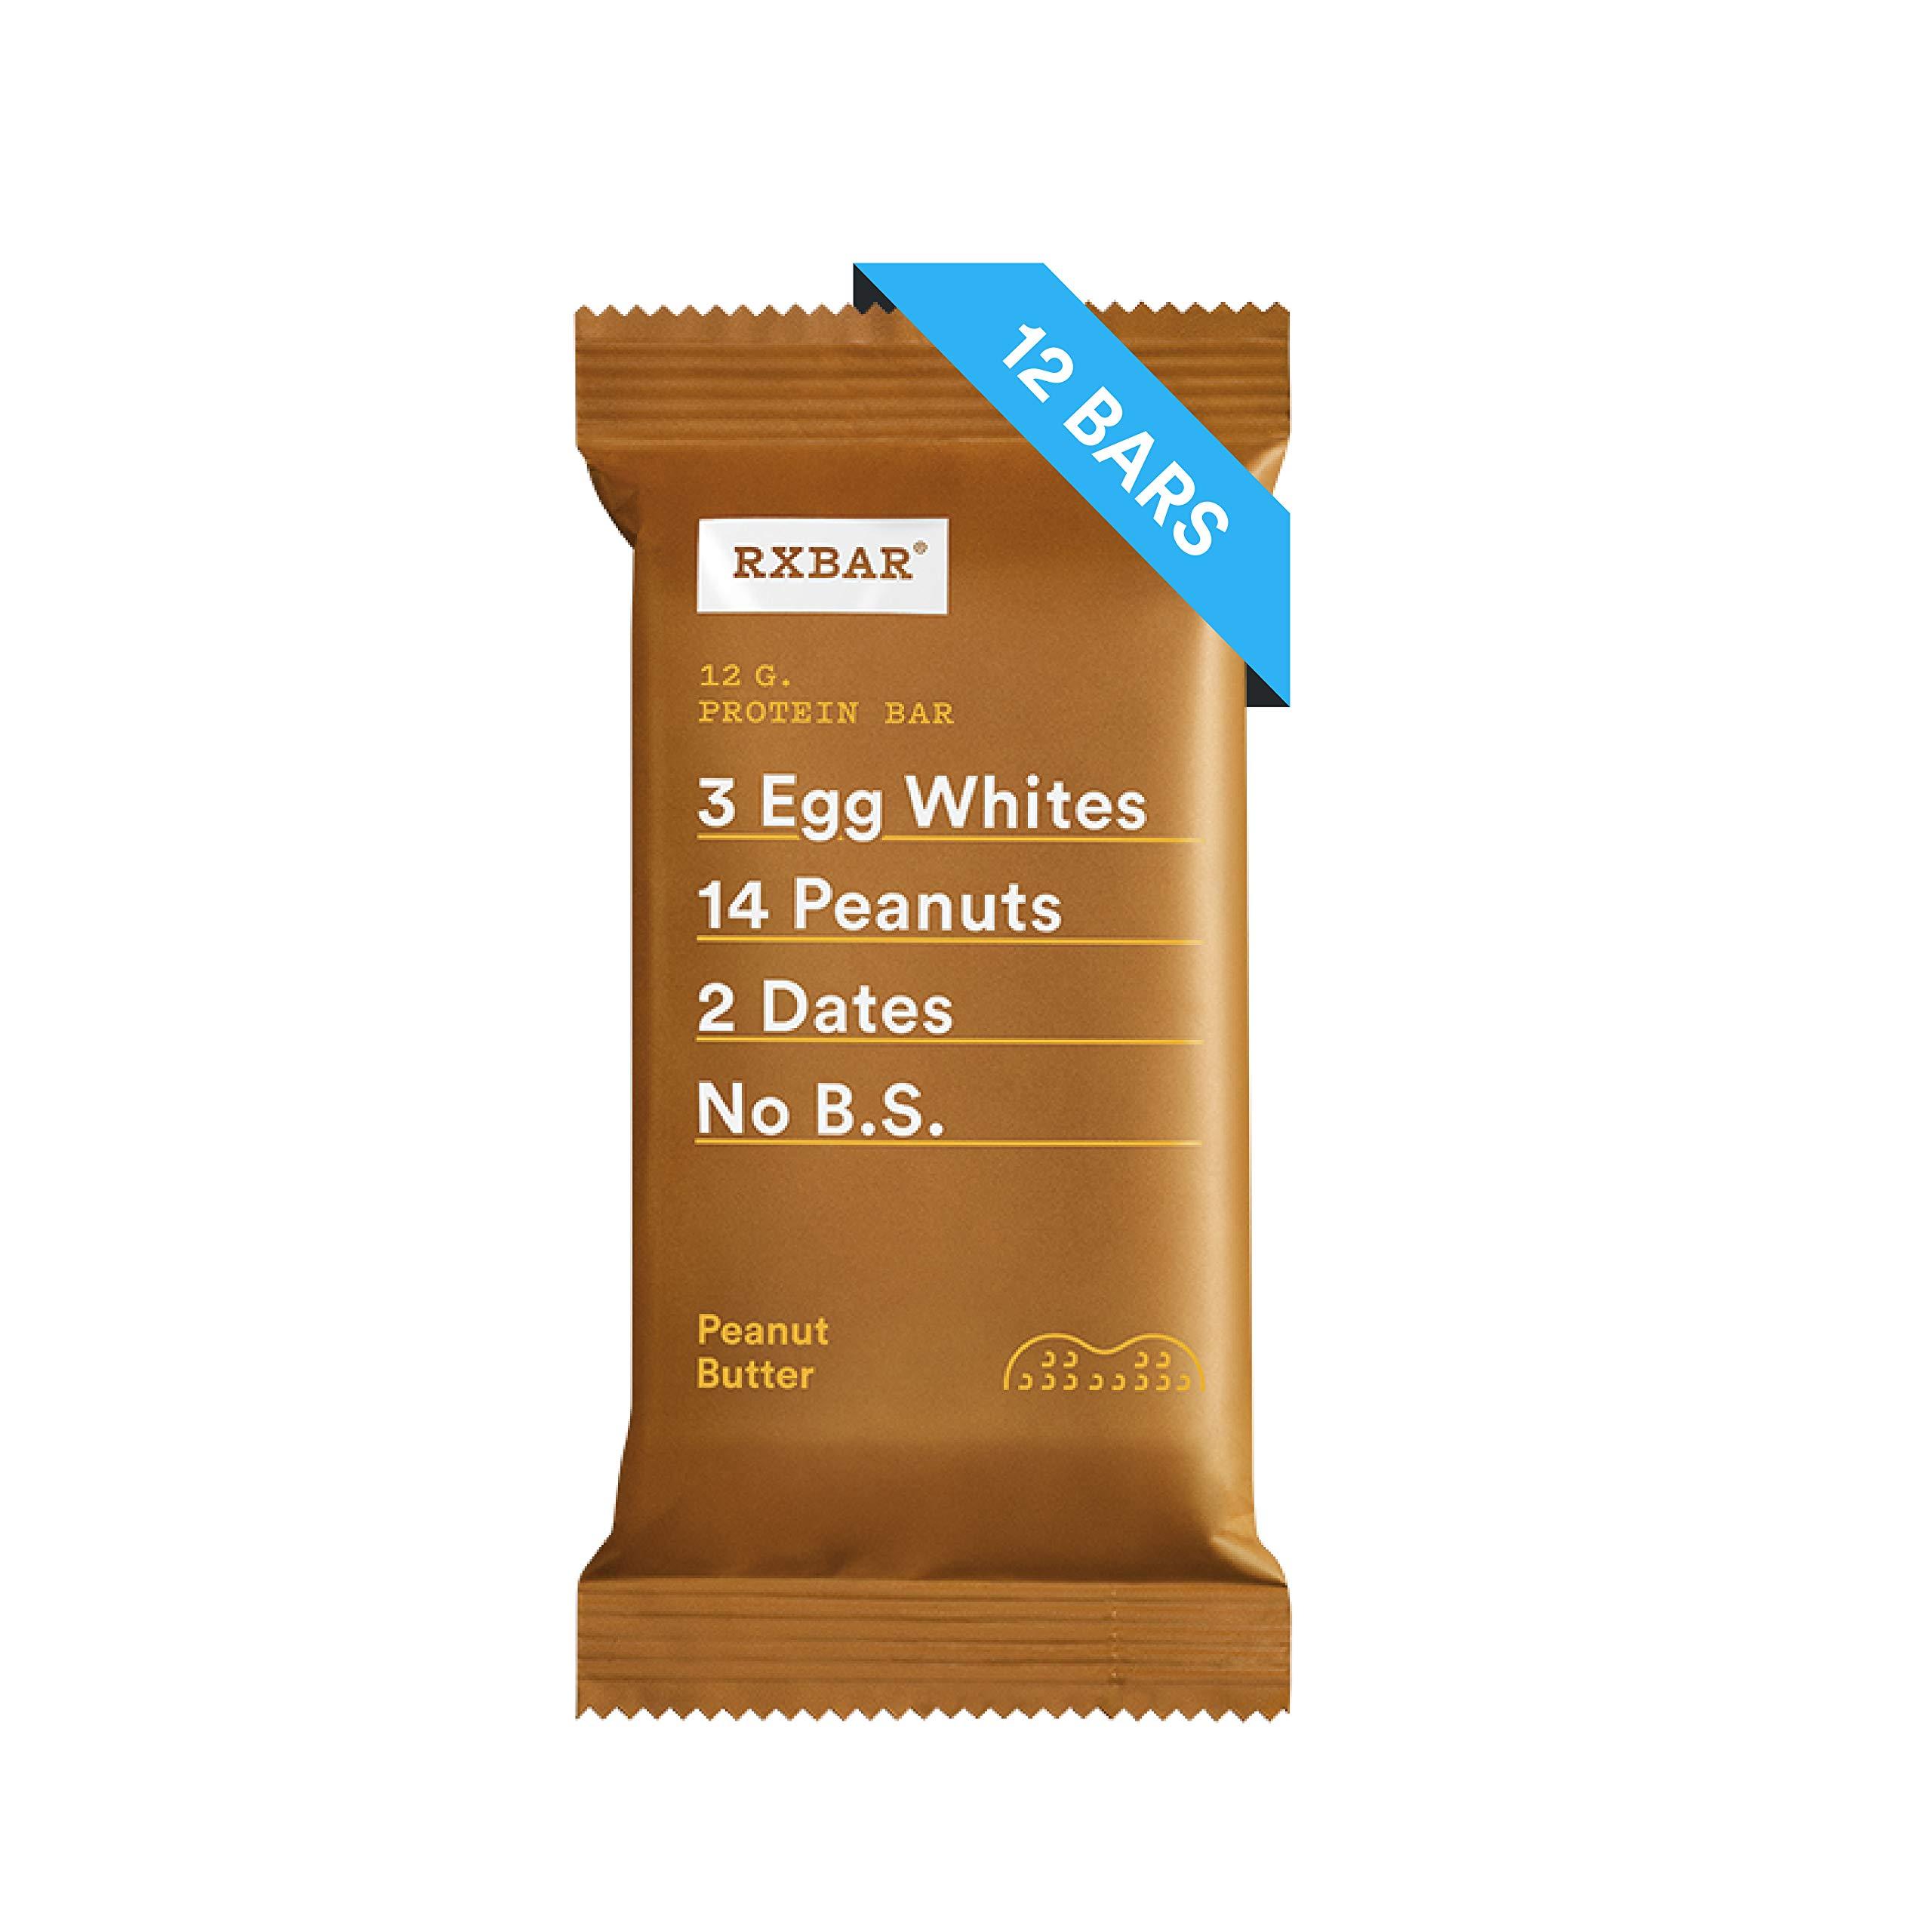 RXBAR Peanut Butter, High Protein Snack, Breakfast Bar, 12 Count by RXBAR